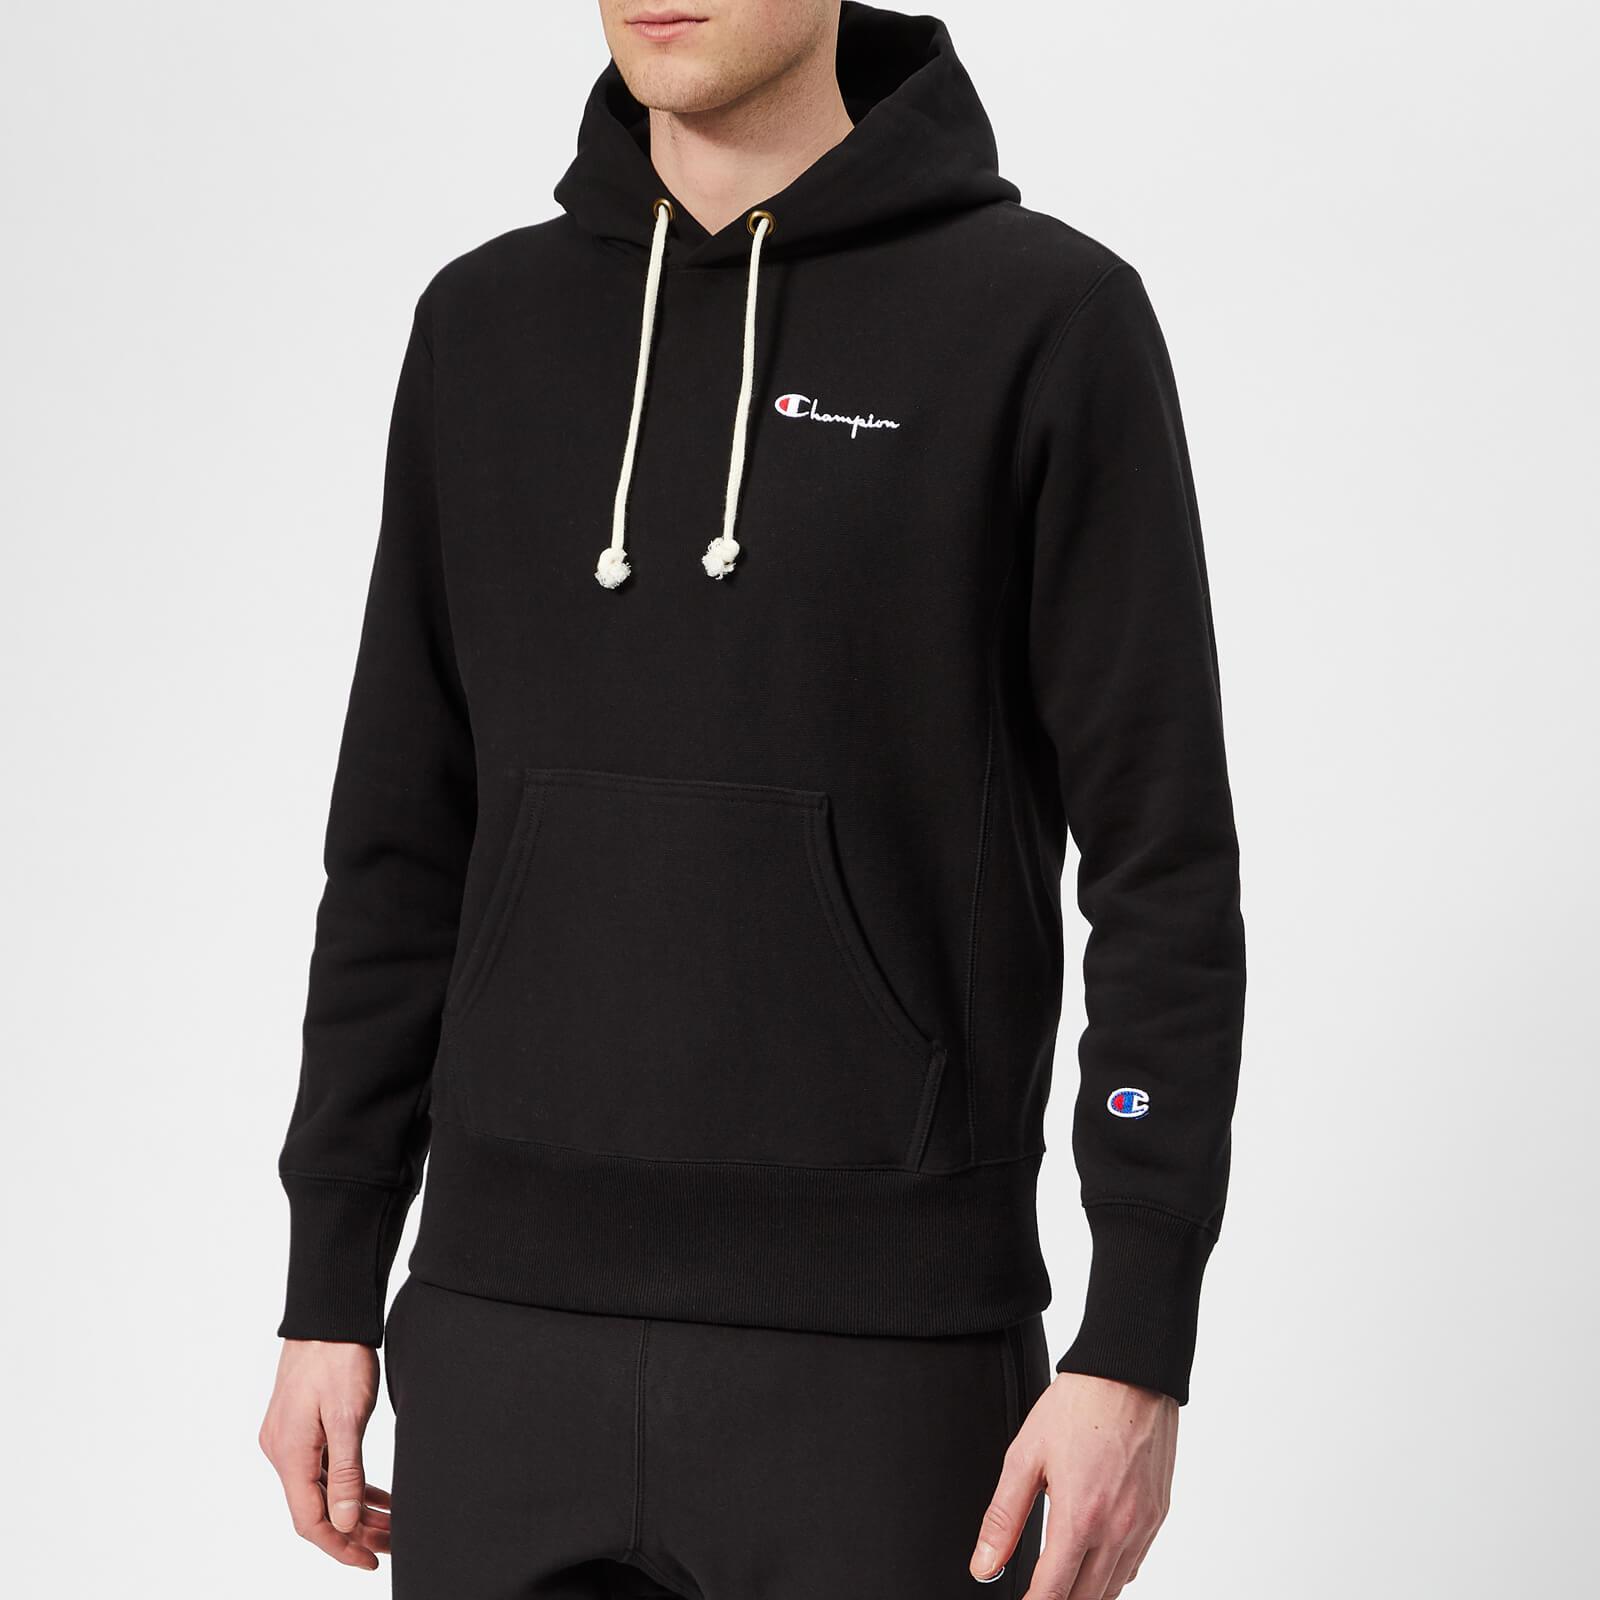 Champion Men's Small Logo Hooded Sweatshirt - Black - S